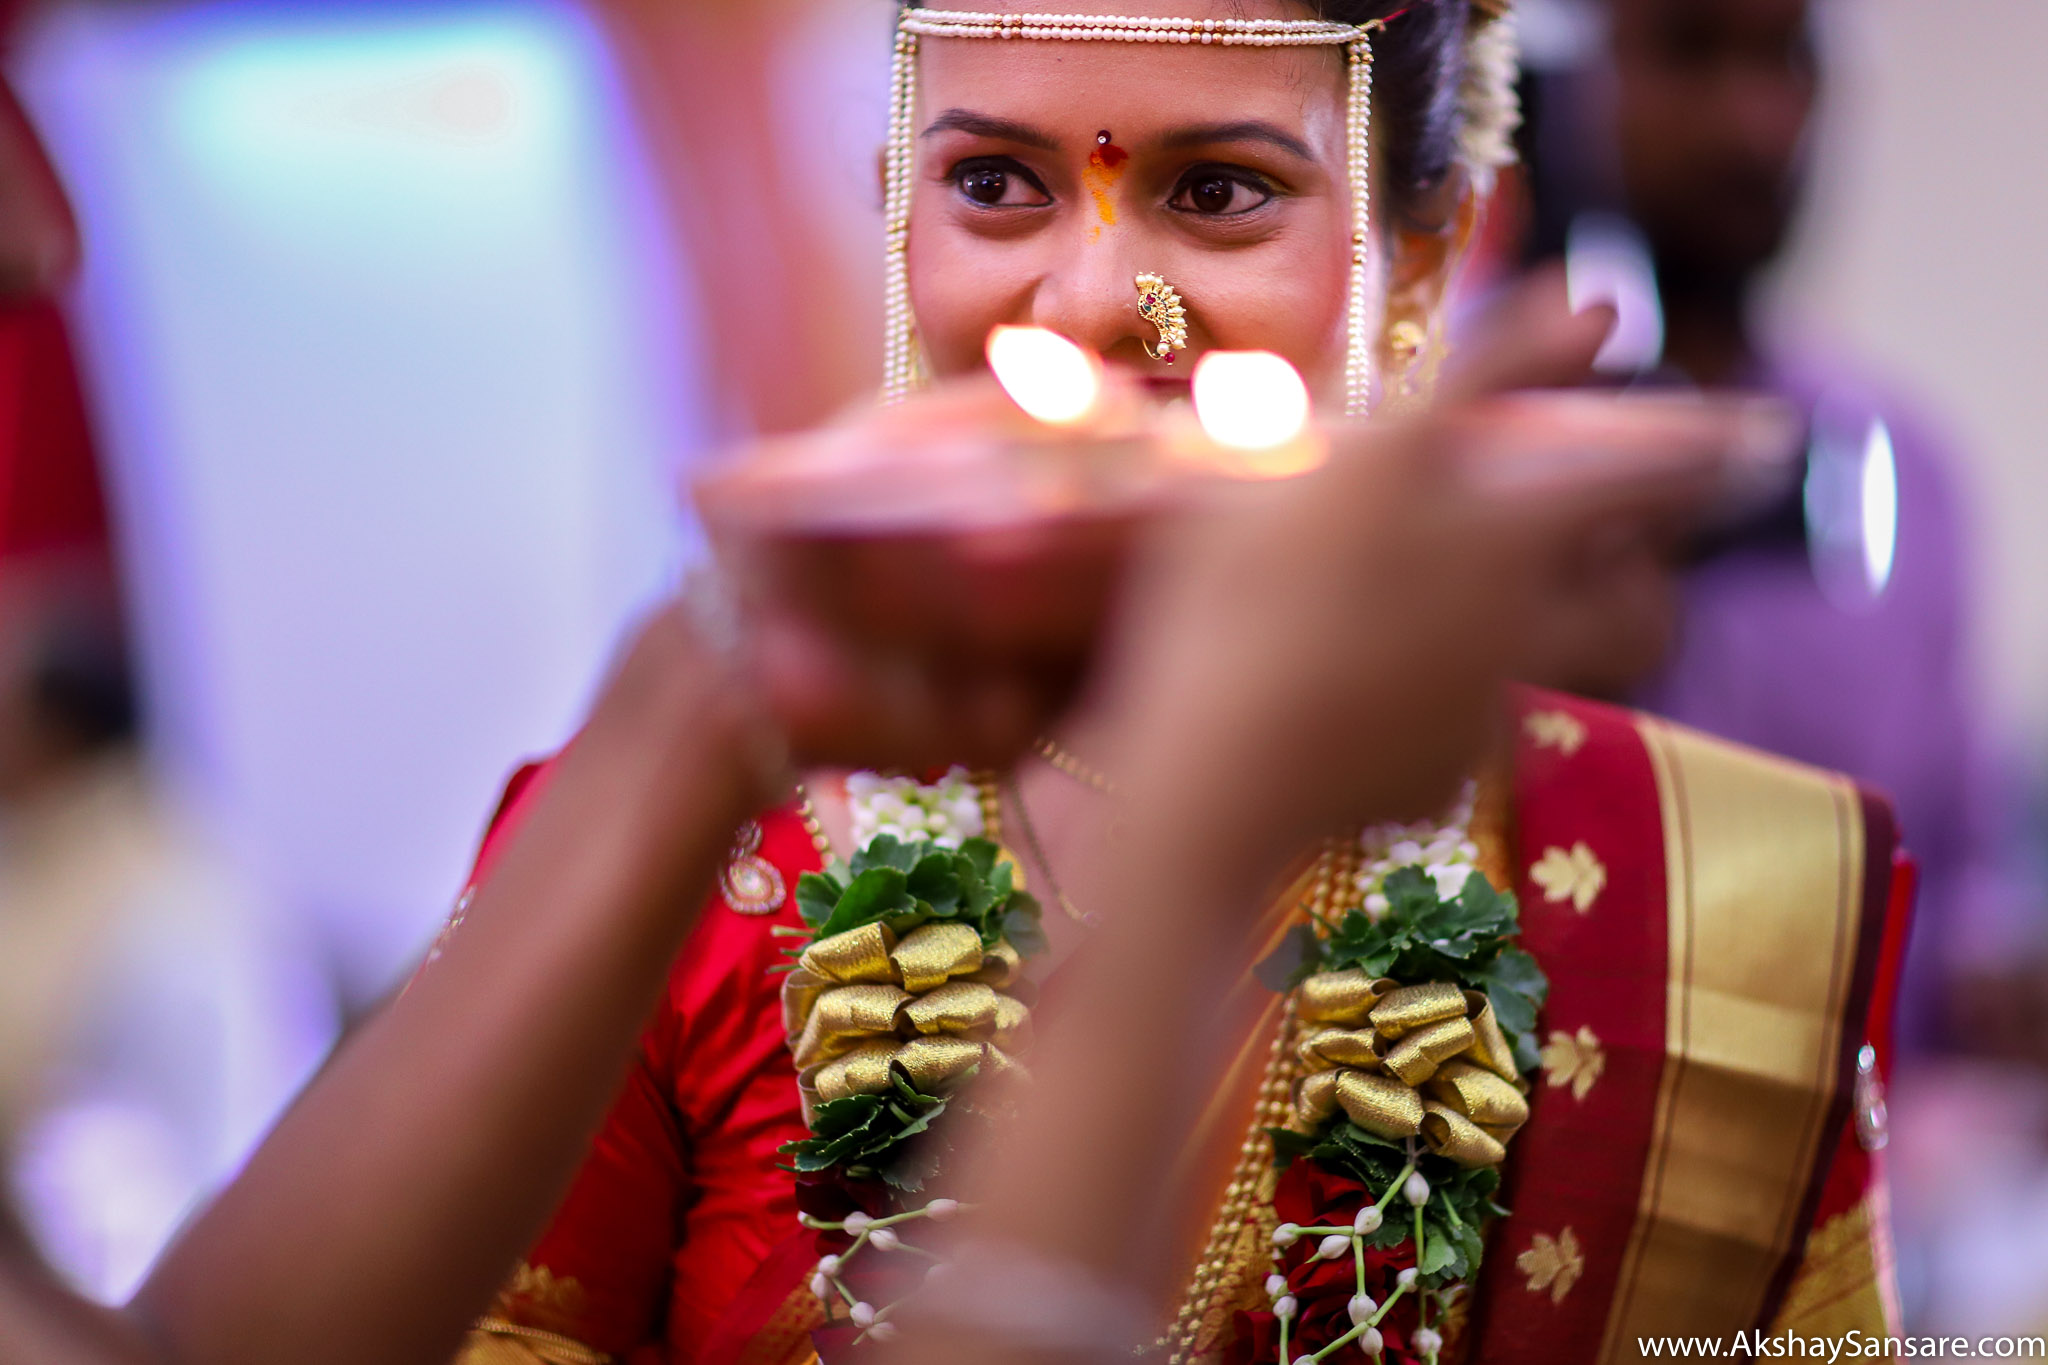 Aditya x Poonam Blog Akshay Sansare Photography Candid Photographer in Mumbai Best Cinematic wedding film filmer-13.jpg